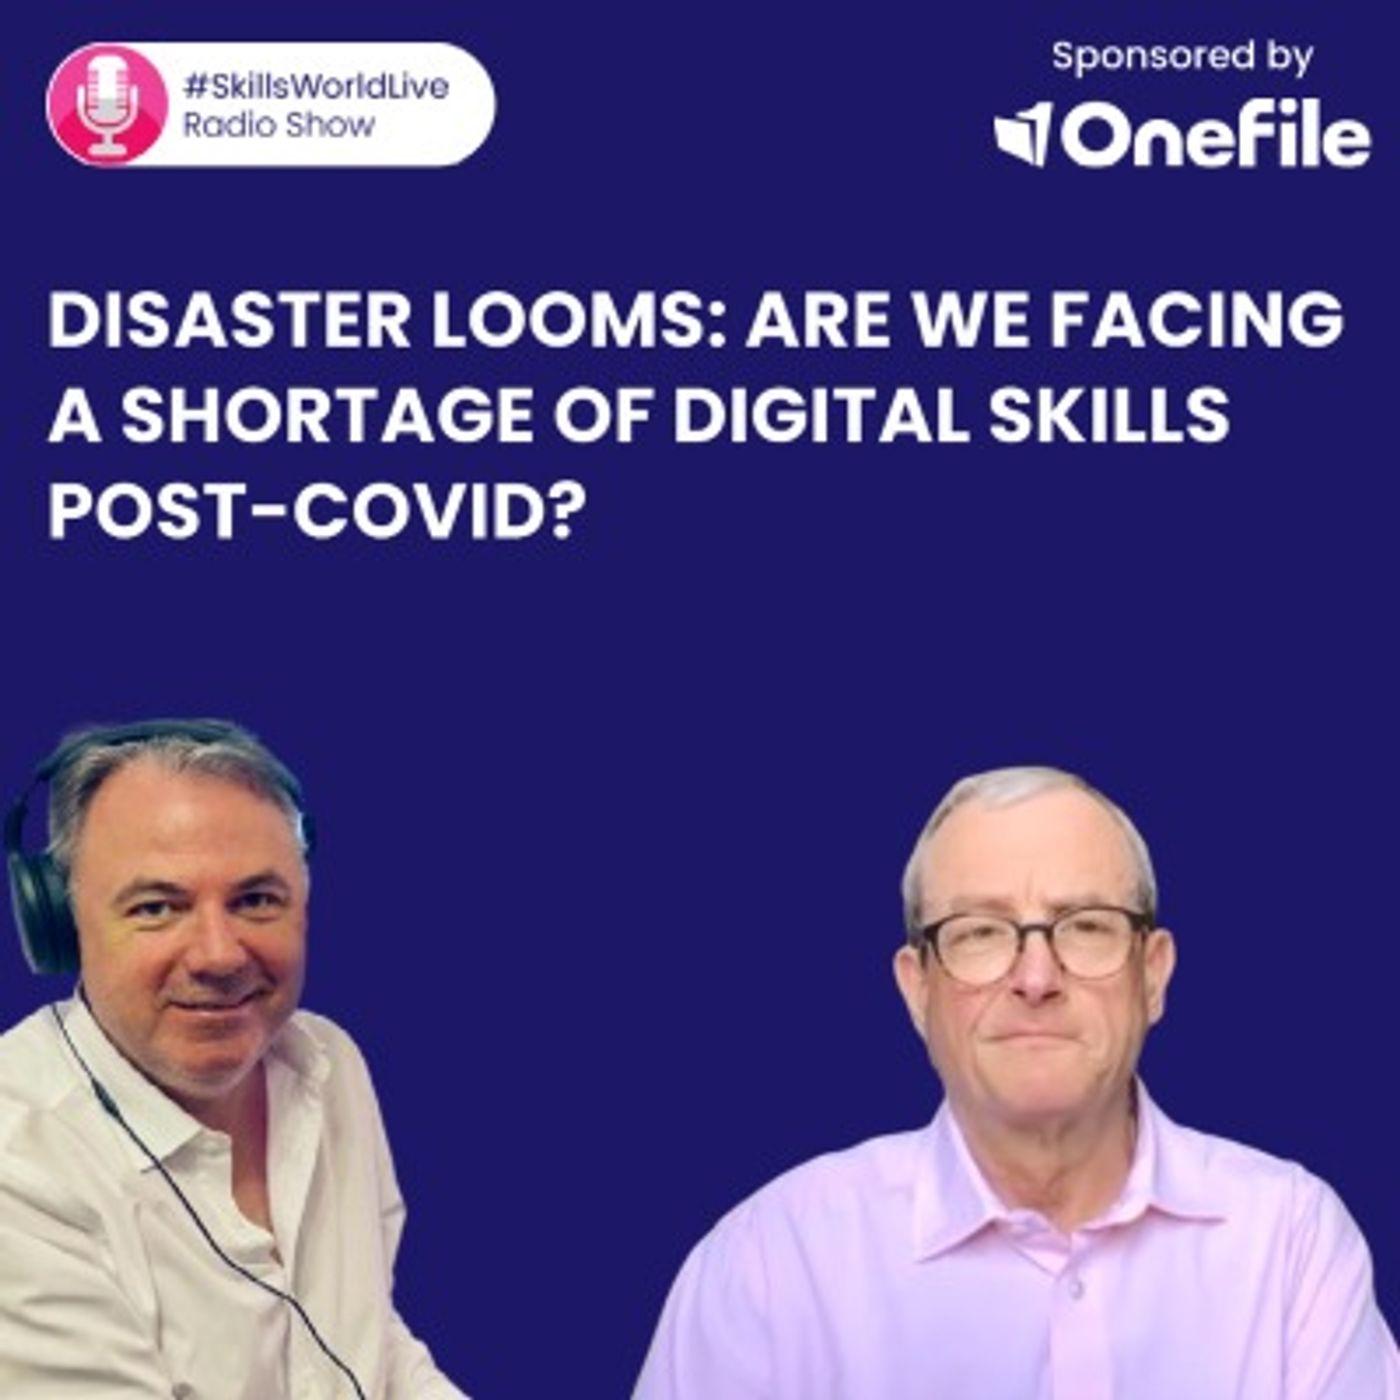 Disaster looms: Are we facing a shortage of digital skills post-Covid? #SkillsWorldLive 3.5